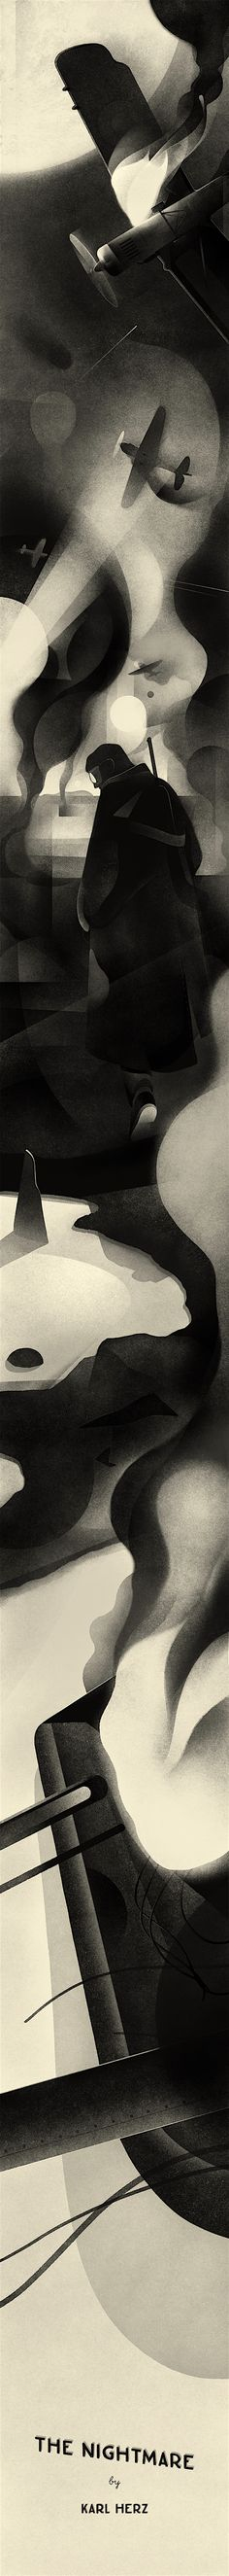 Dribbble - war-strautniekas-illustration-behance2.jpg by Karolis Strautniekas